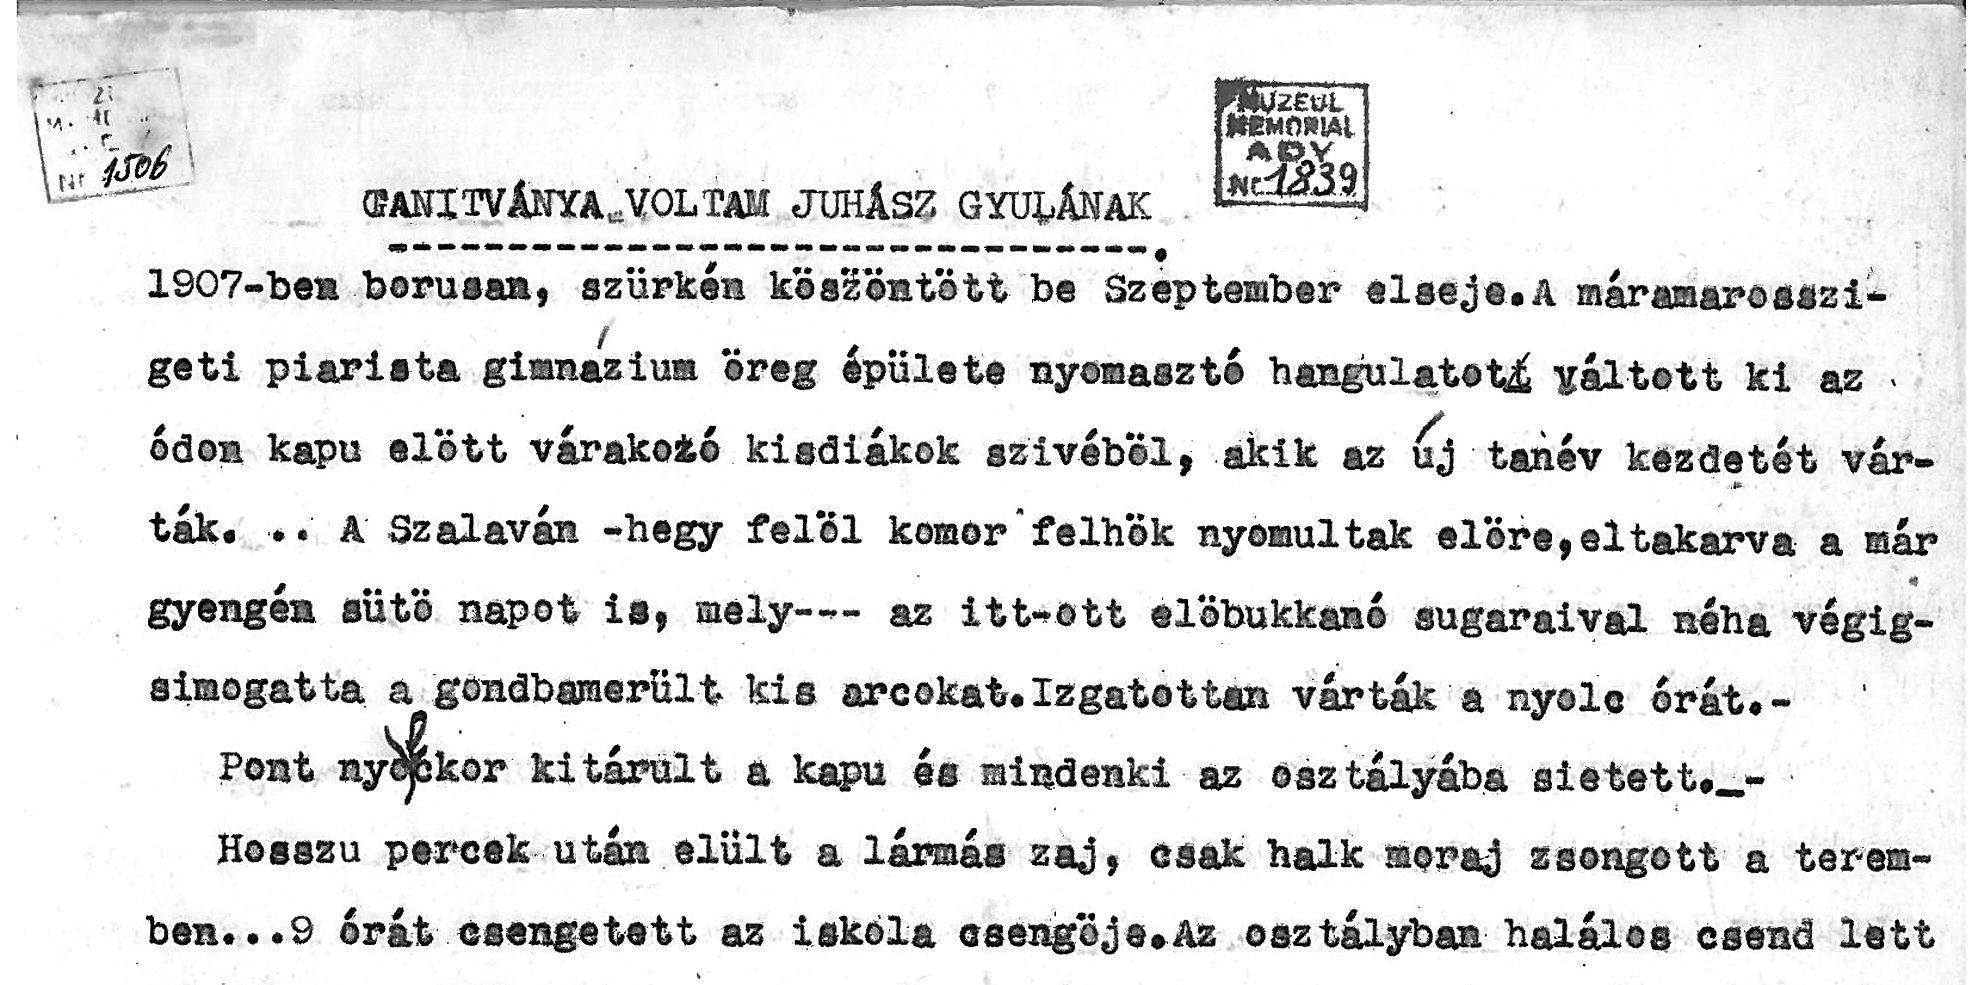 Juhasz Gyula 04 PS 1